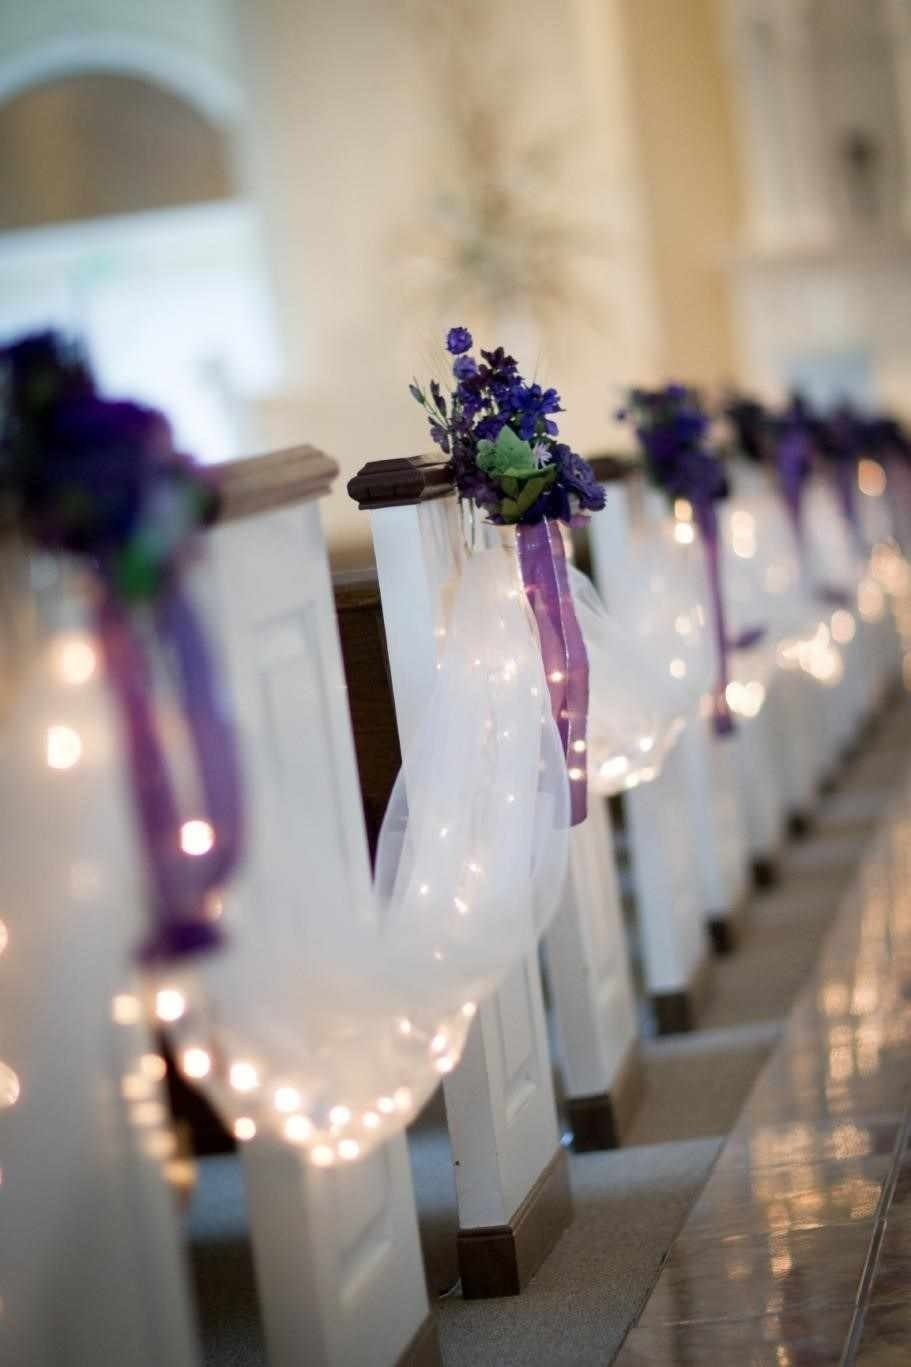 10 Stylish Wedding Ceremony Ideas Instead Of Unity Candle unity candle ceremony ideas wedding gallery 2021